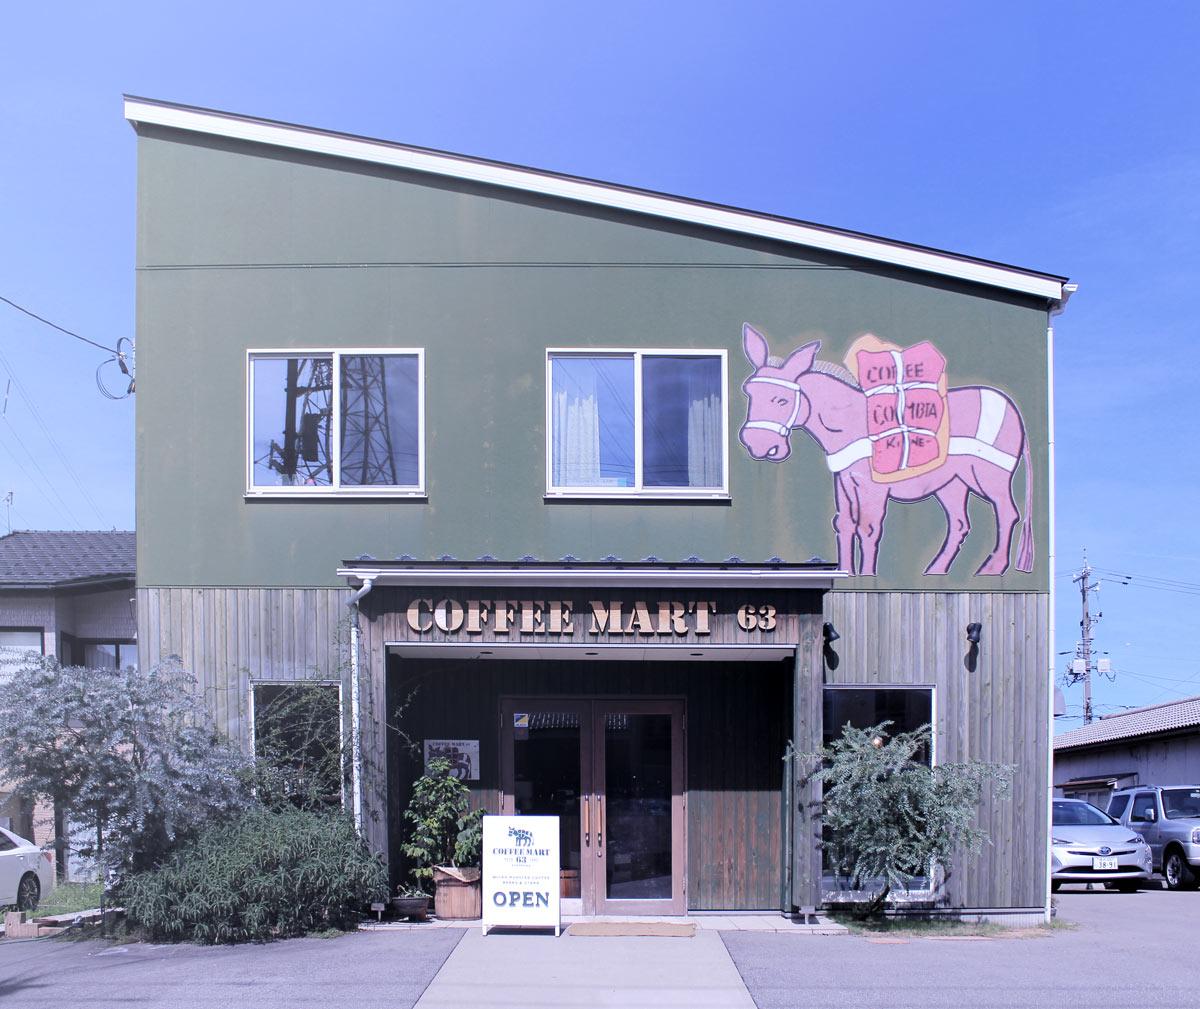 COFFEE MART63 店舗